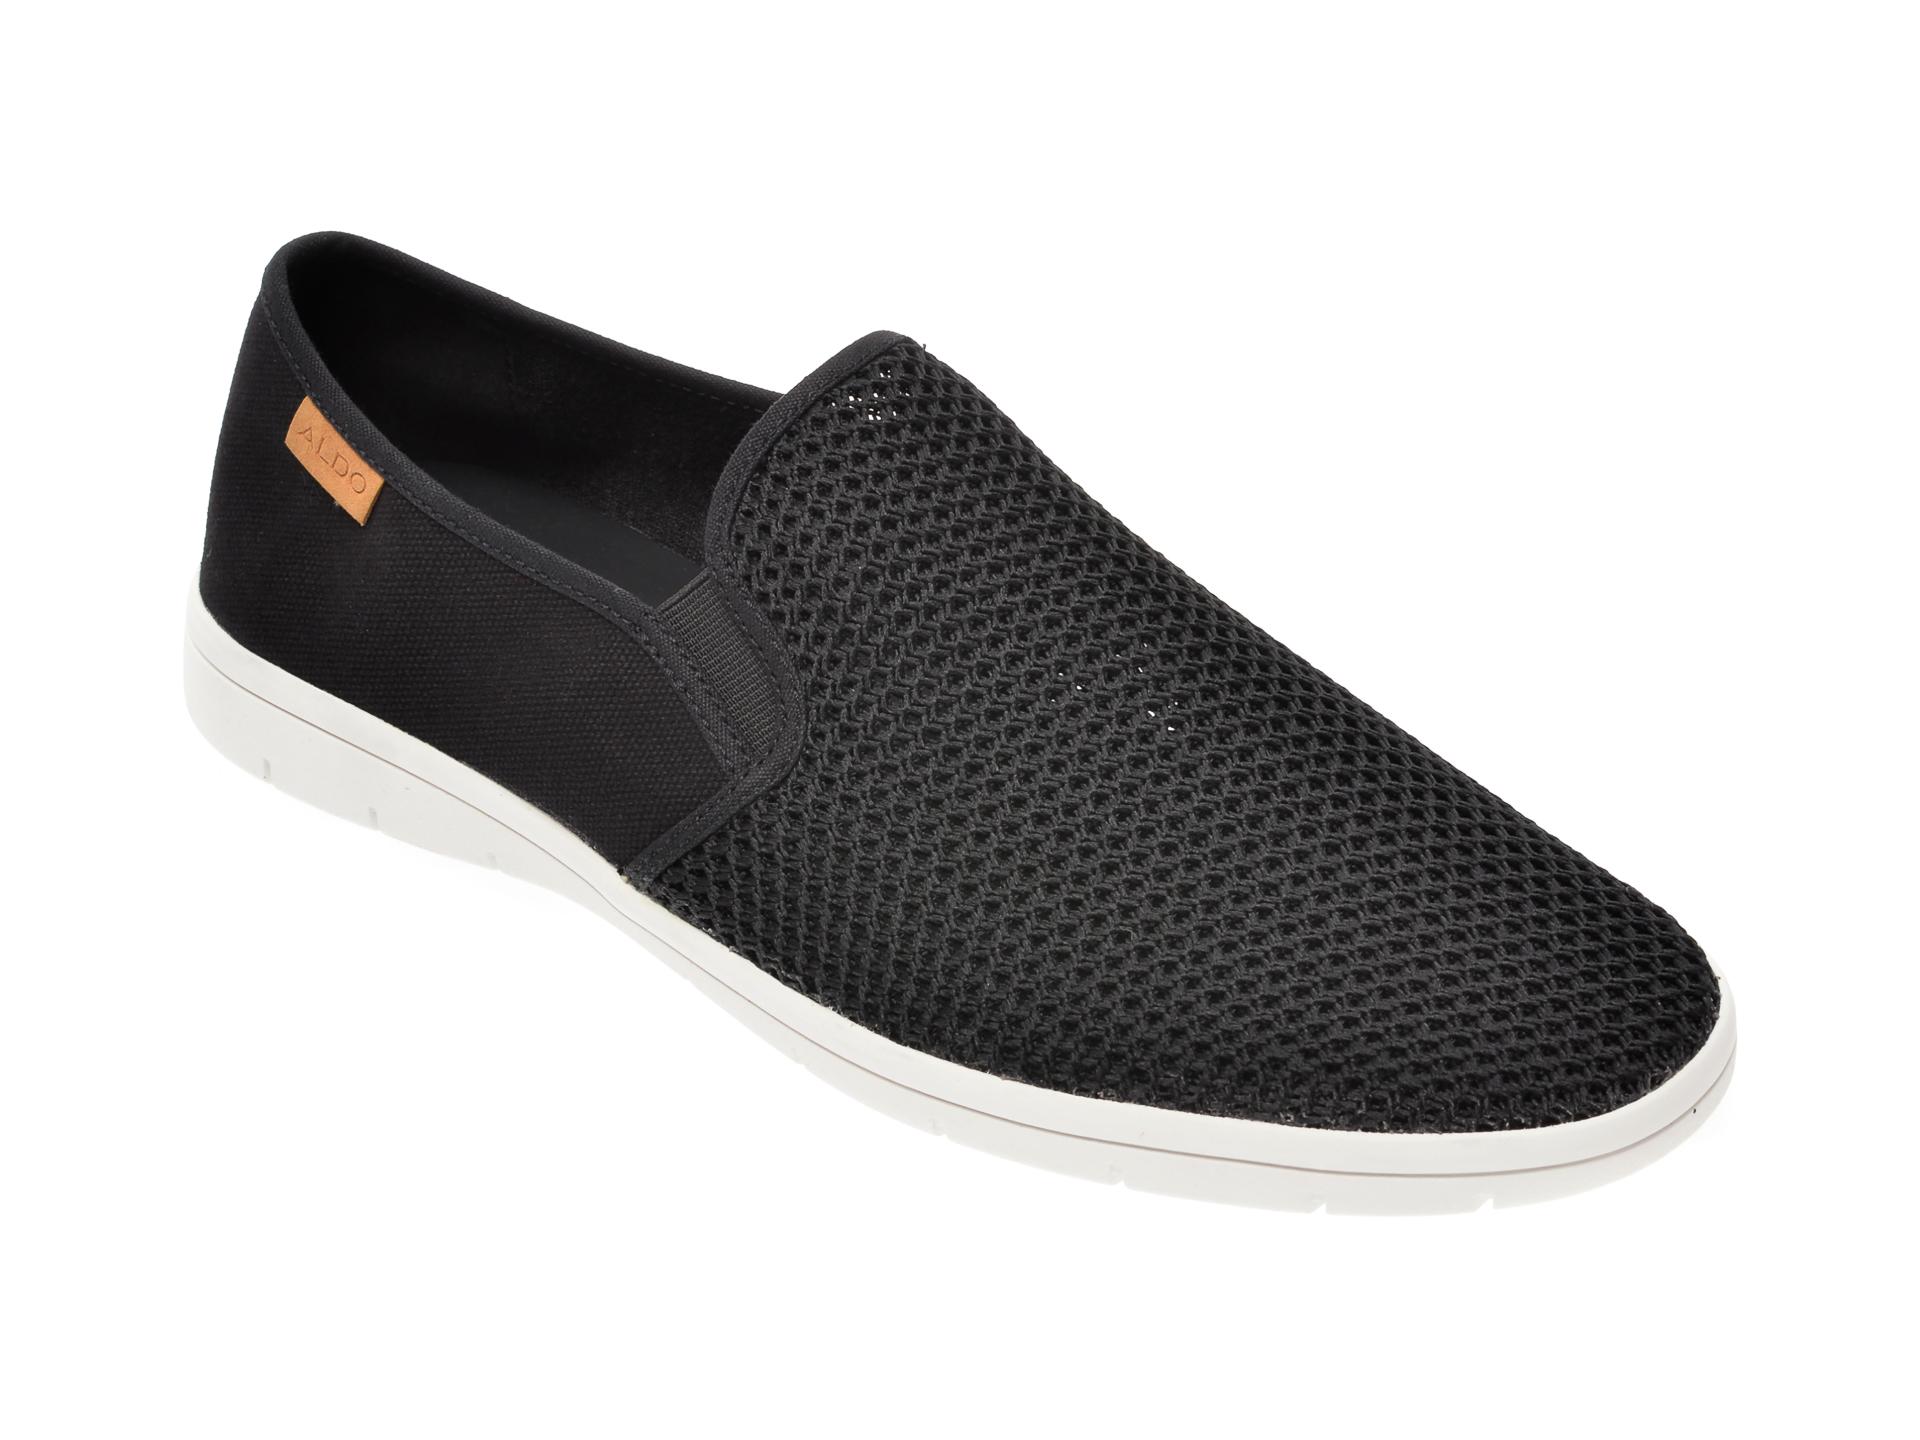 Pantofi ALDO negri, Liberace001, din material textil imagine